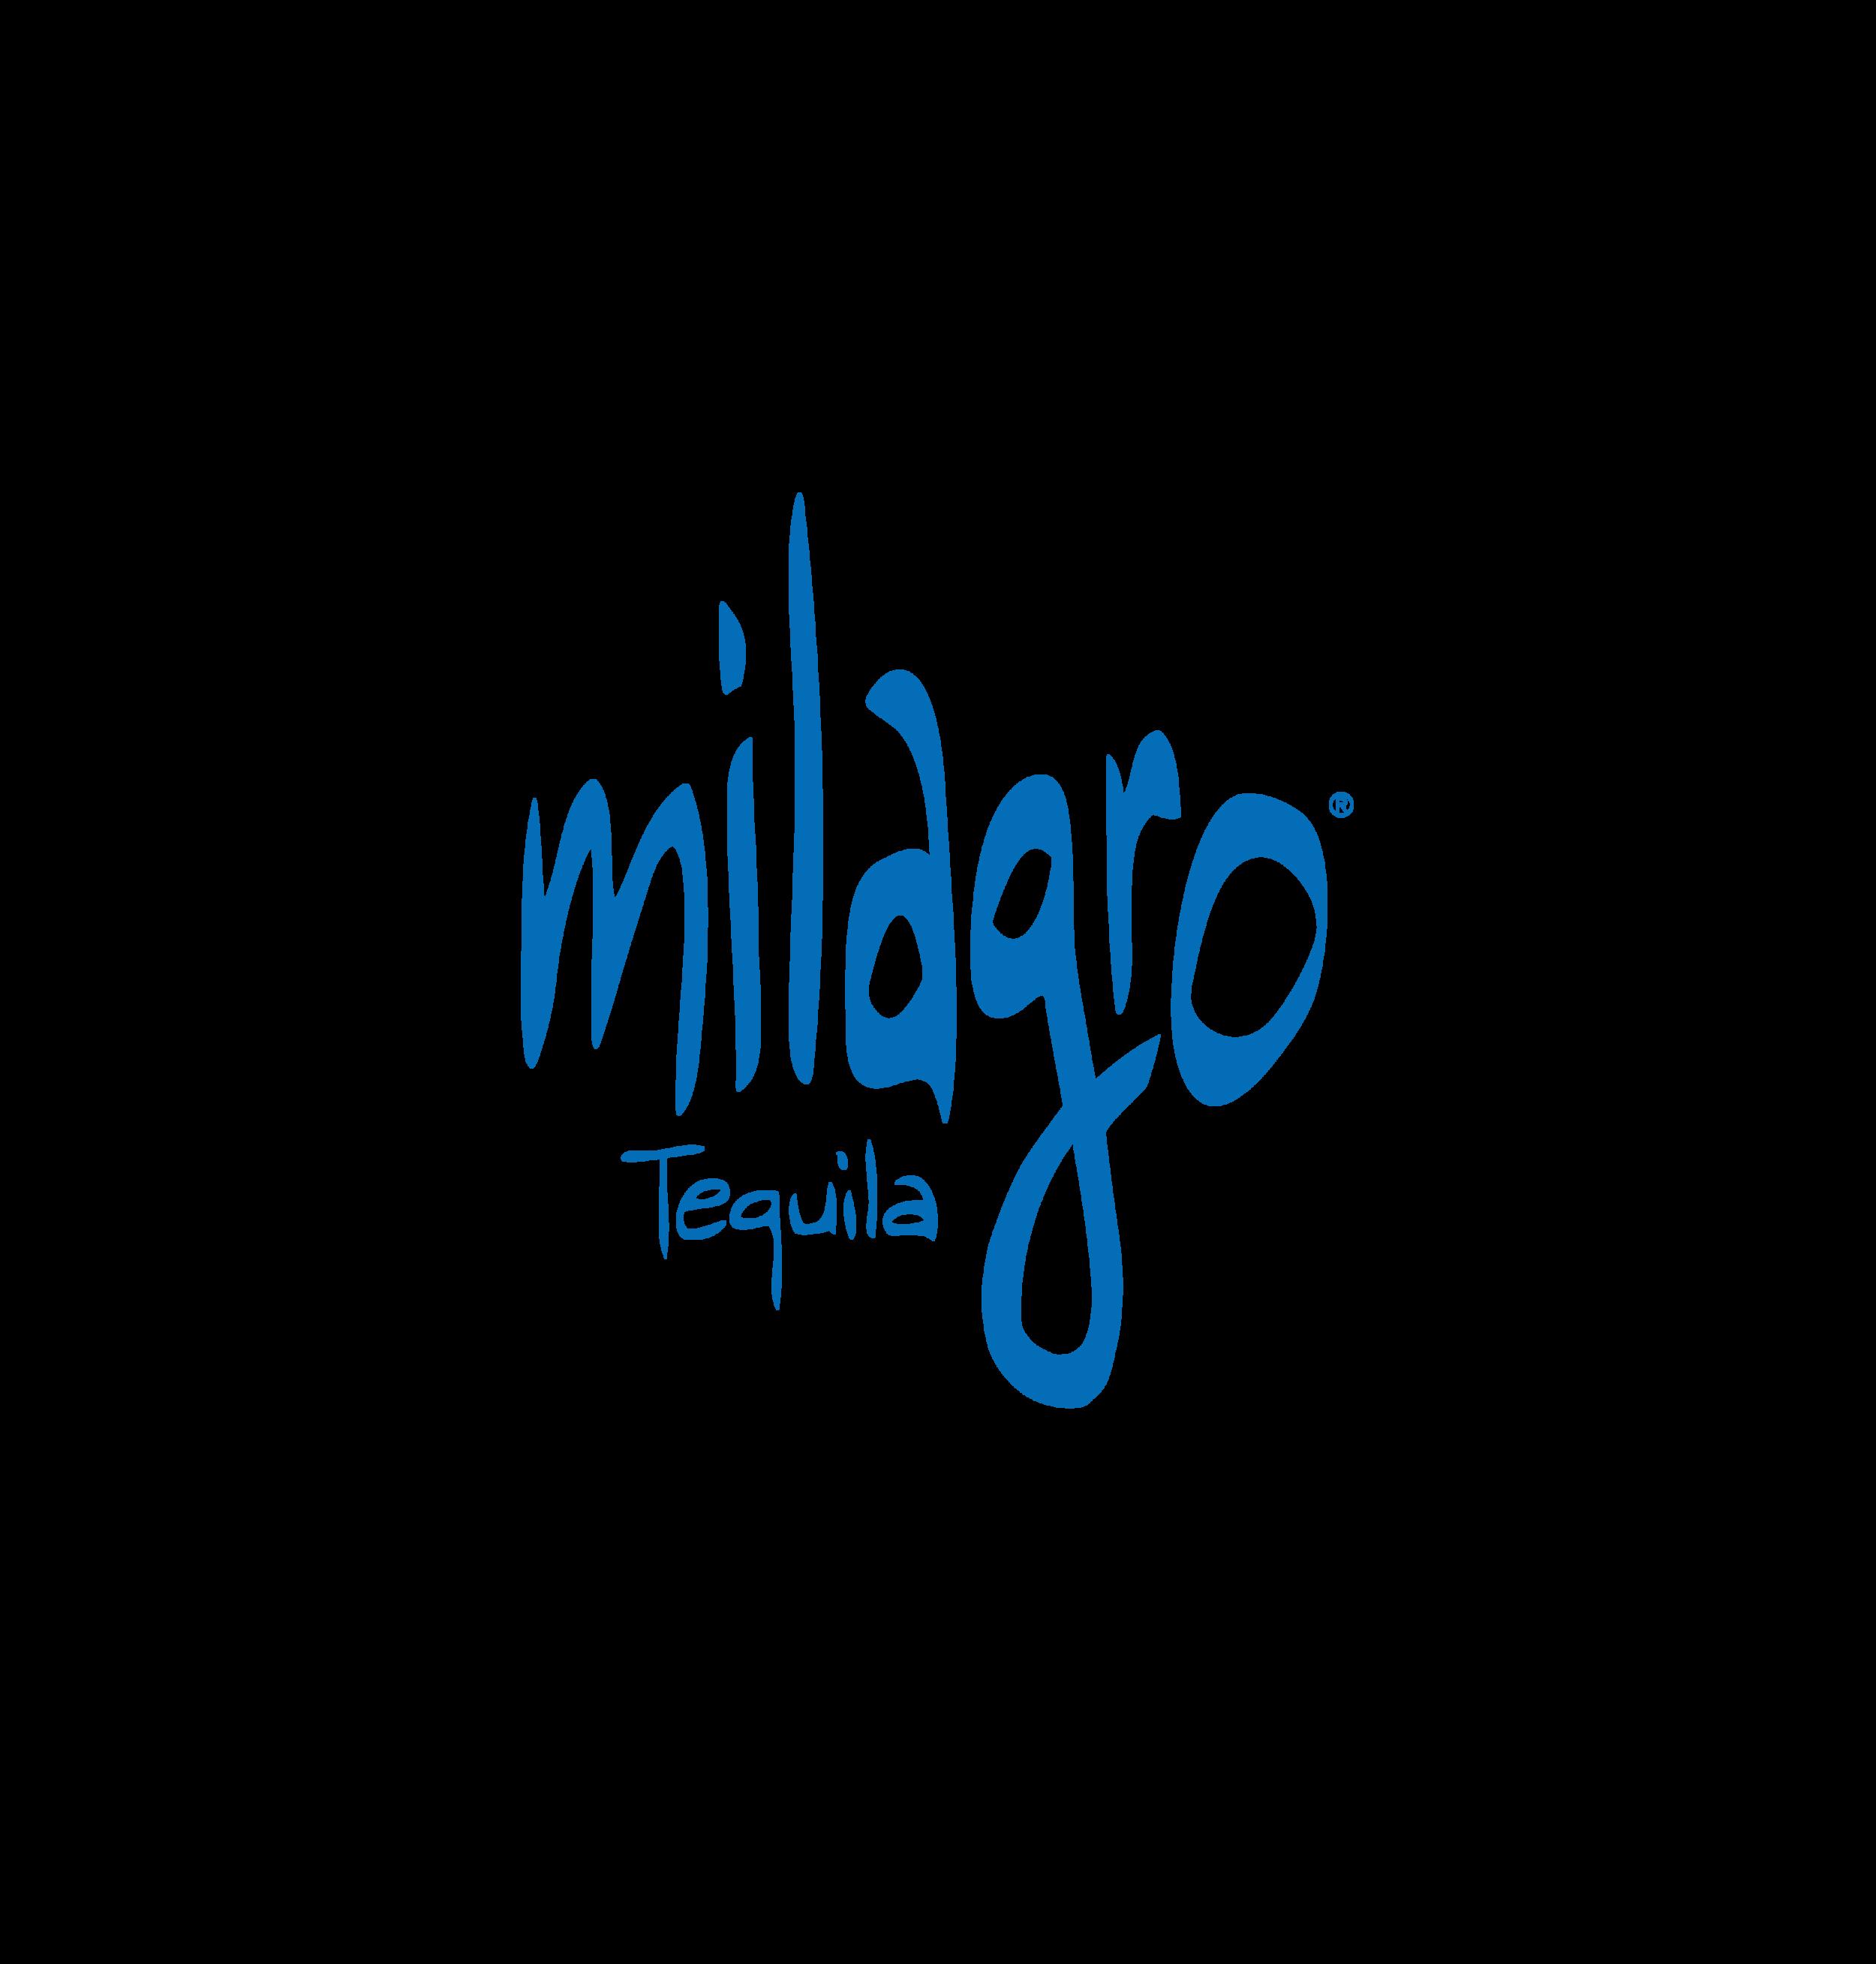 Milagro.png